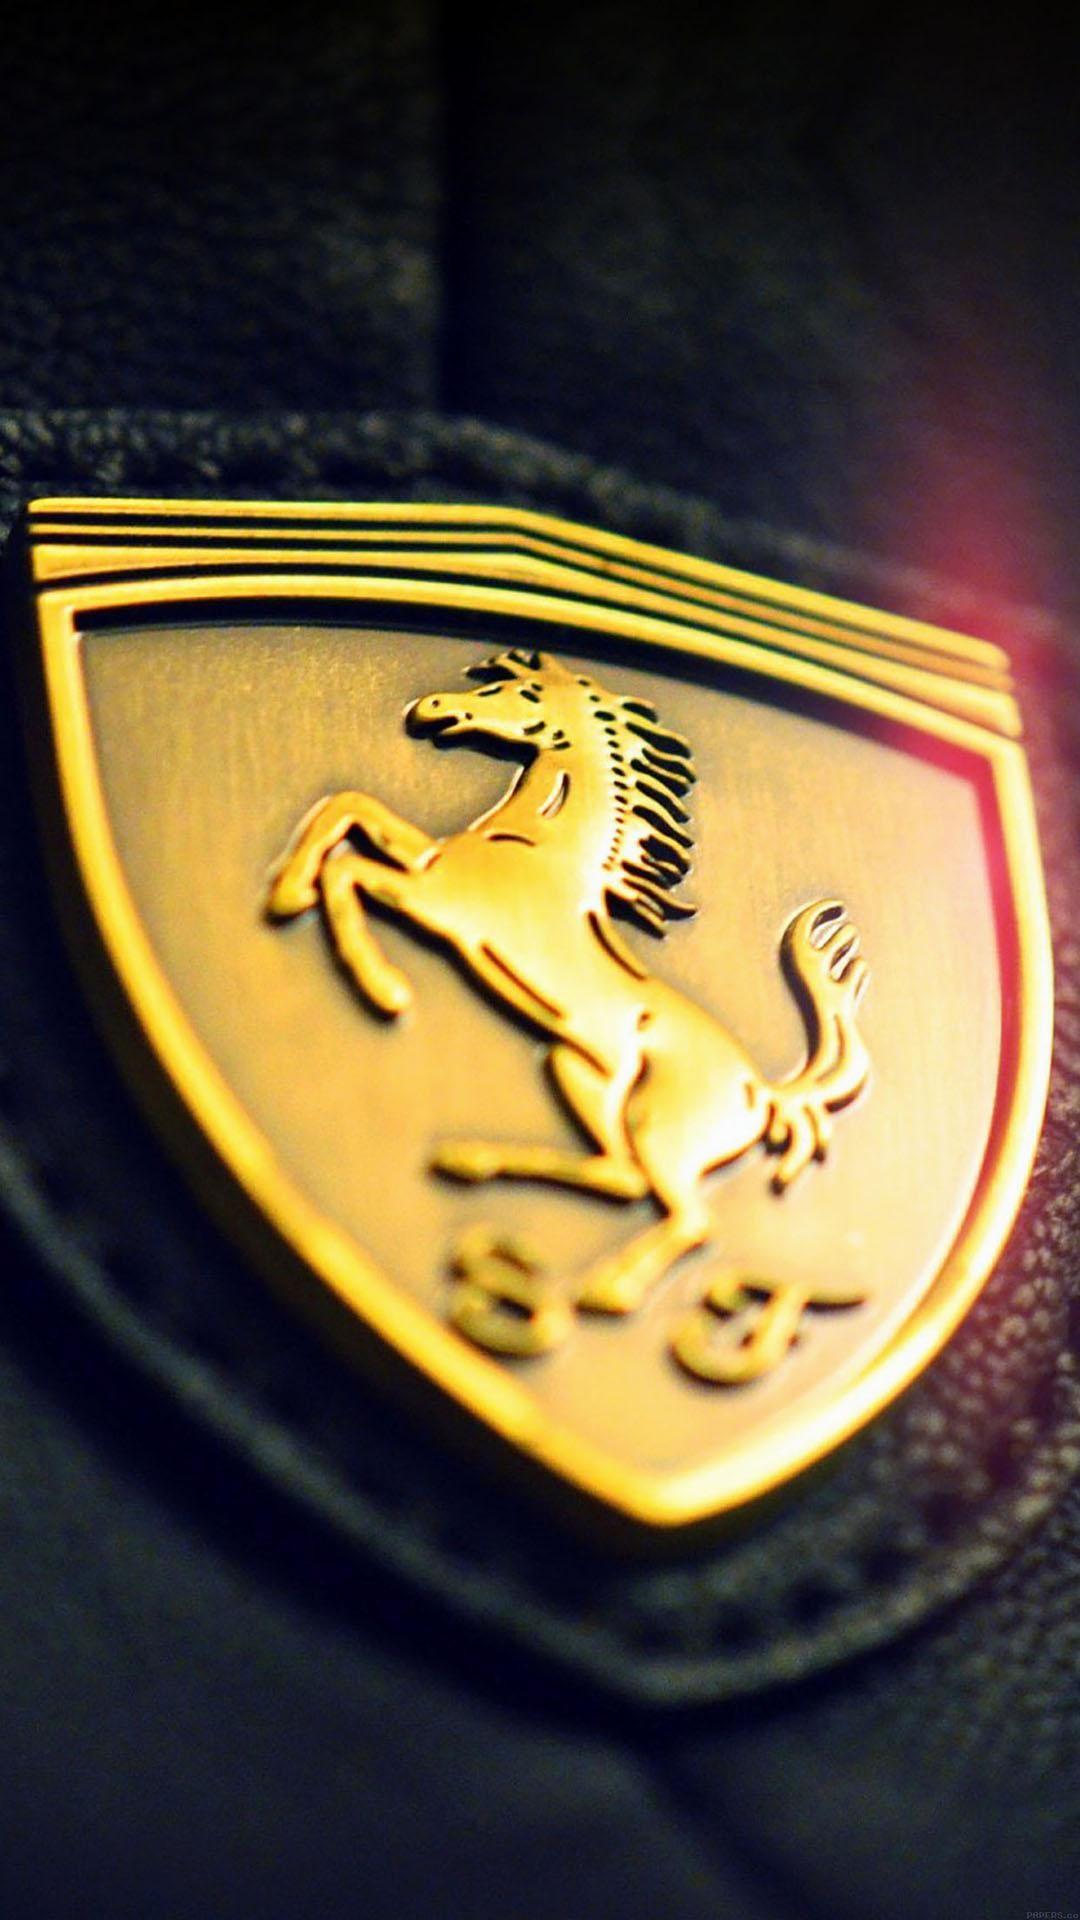 wallpaper.wiki-Ferrari-iPhone-logo-photos-PIC-WPB005133